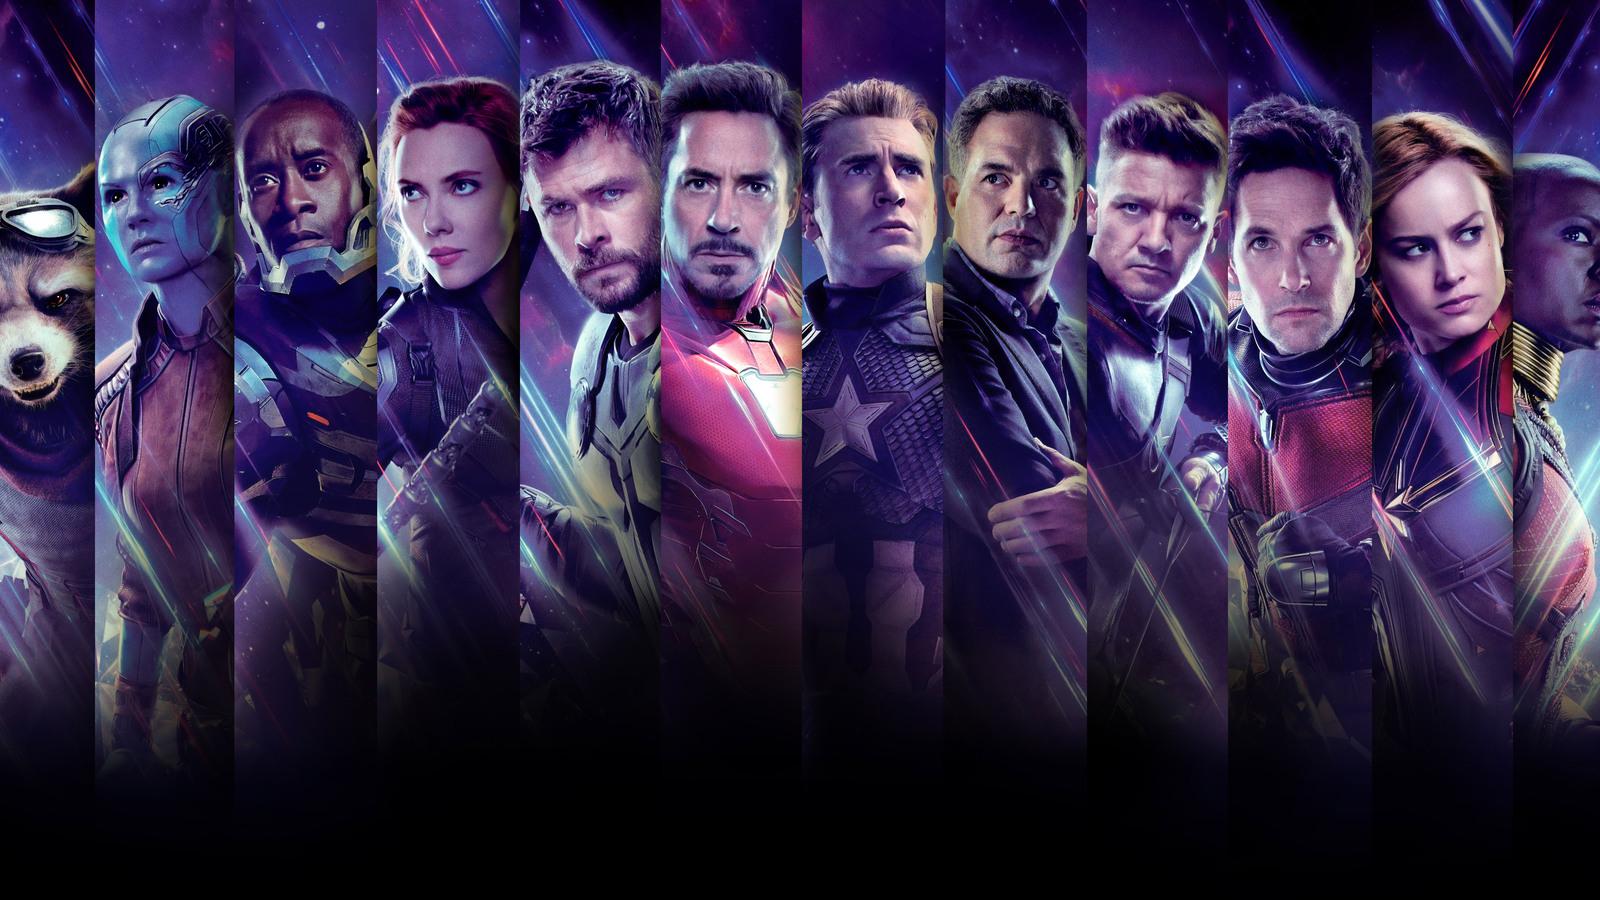 avengers-end-game-collage-poster-12k-72.jpg